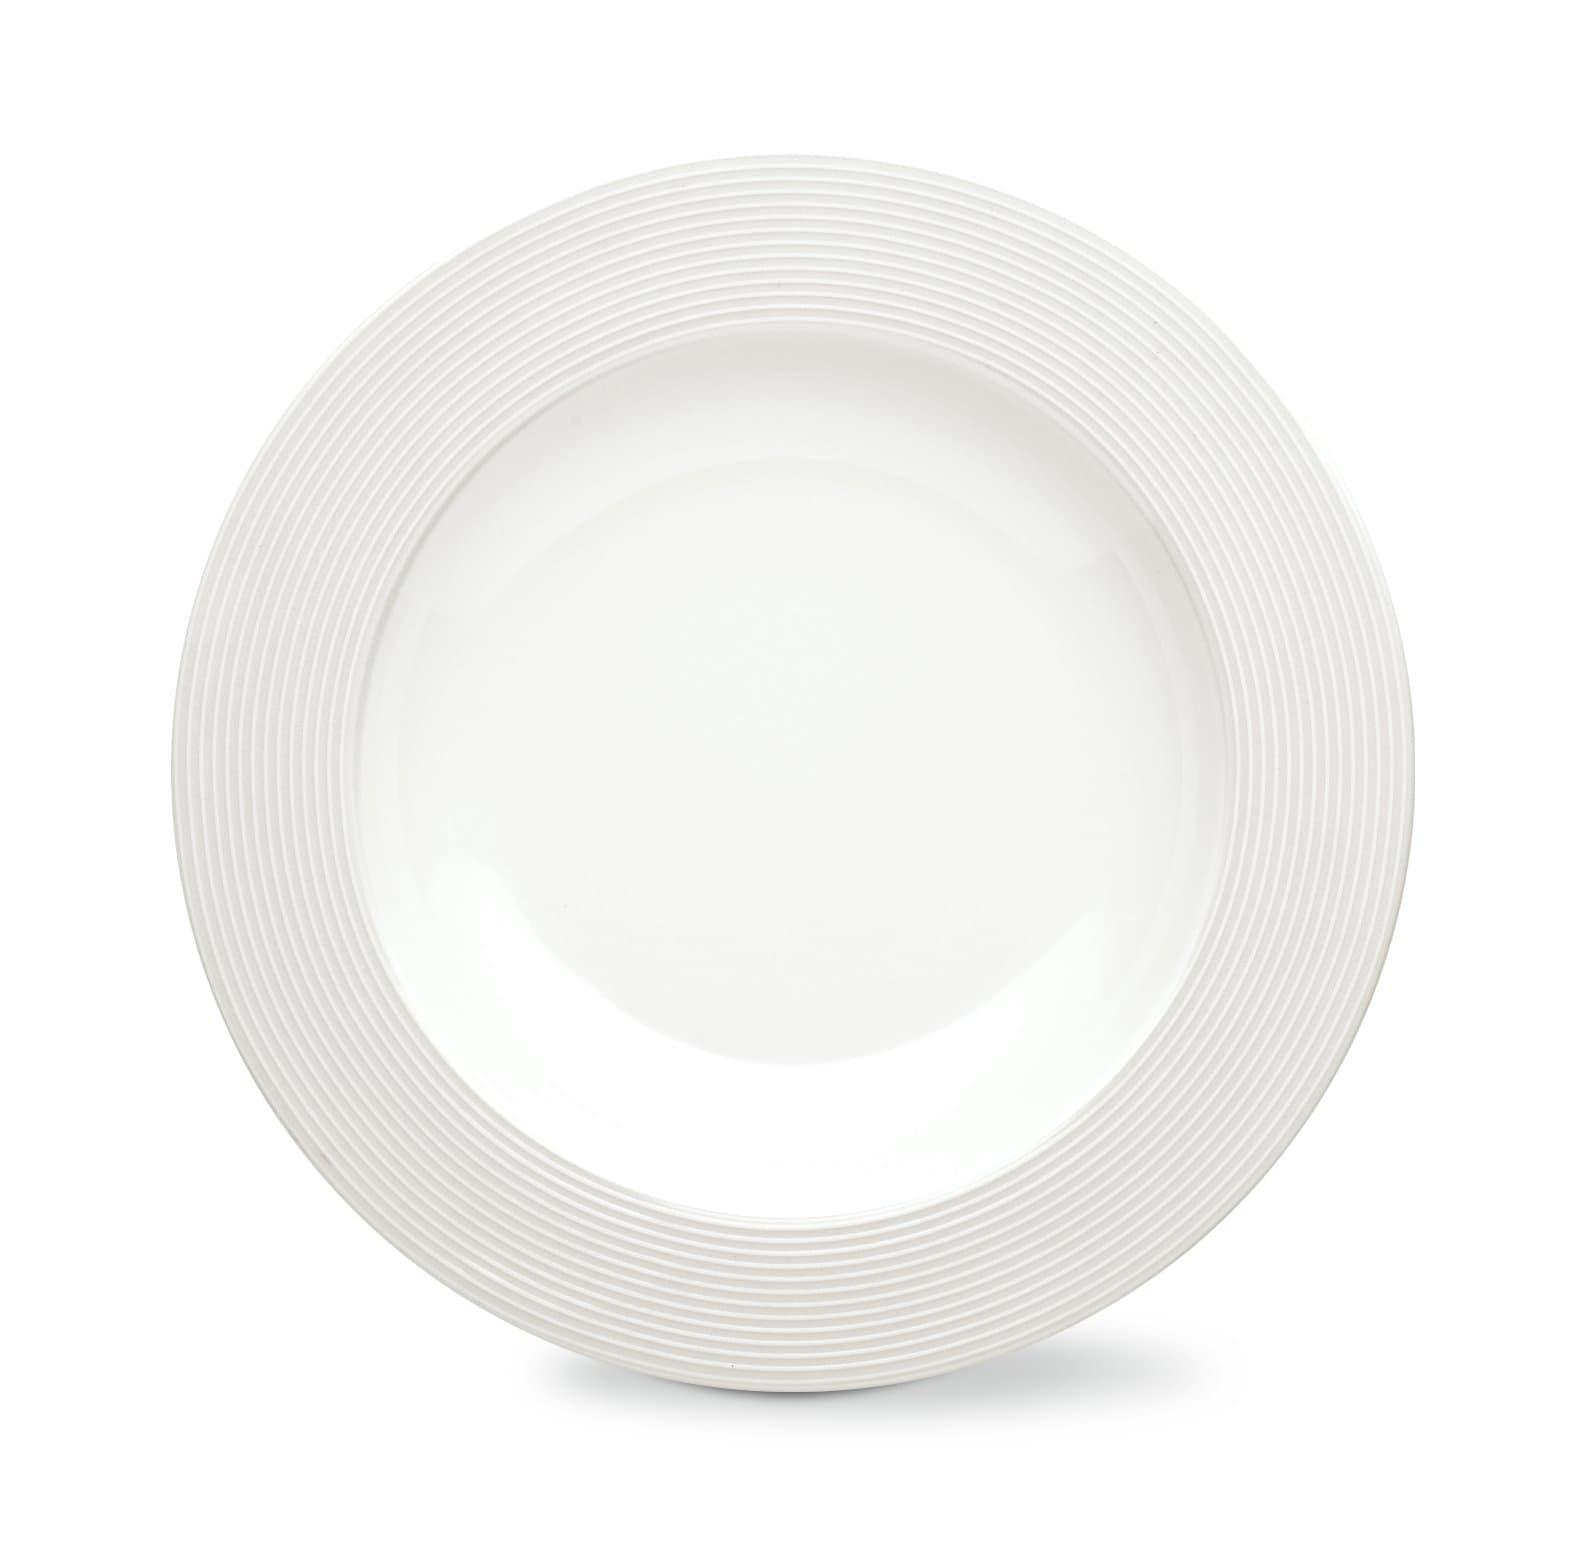 Cucina & Tavola VIENNA Piatto fondo